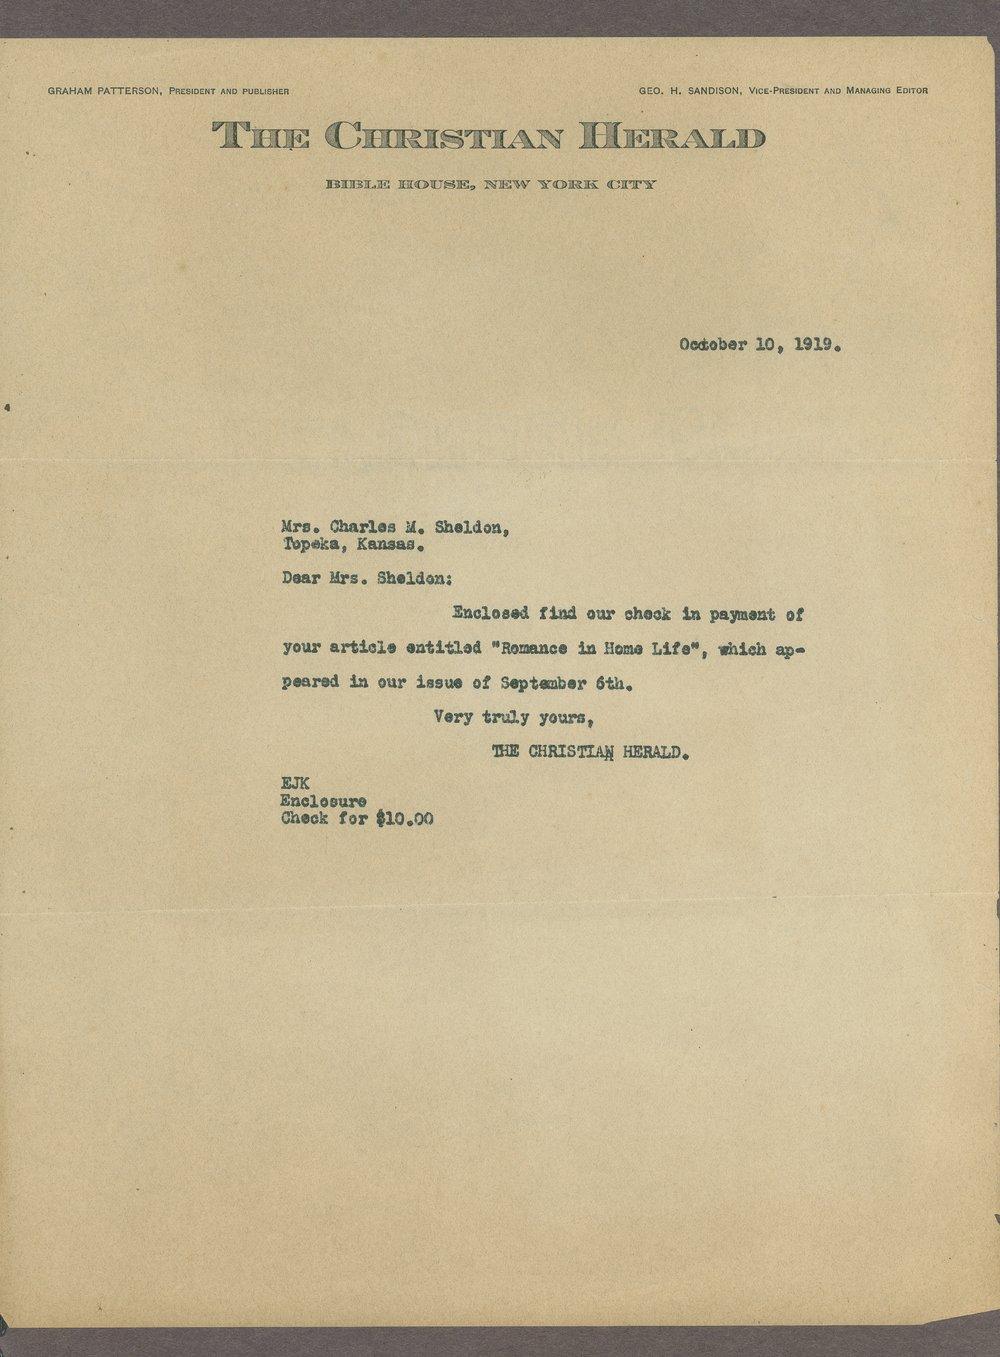 Mary M. Sheldon correspondence - 1